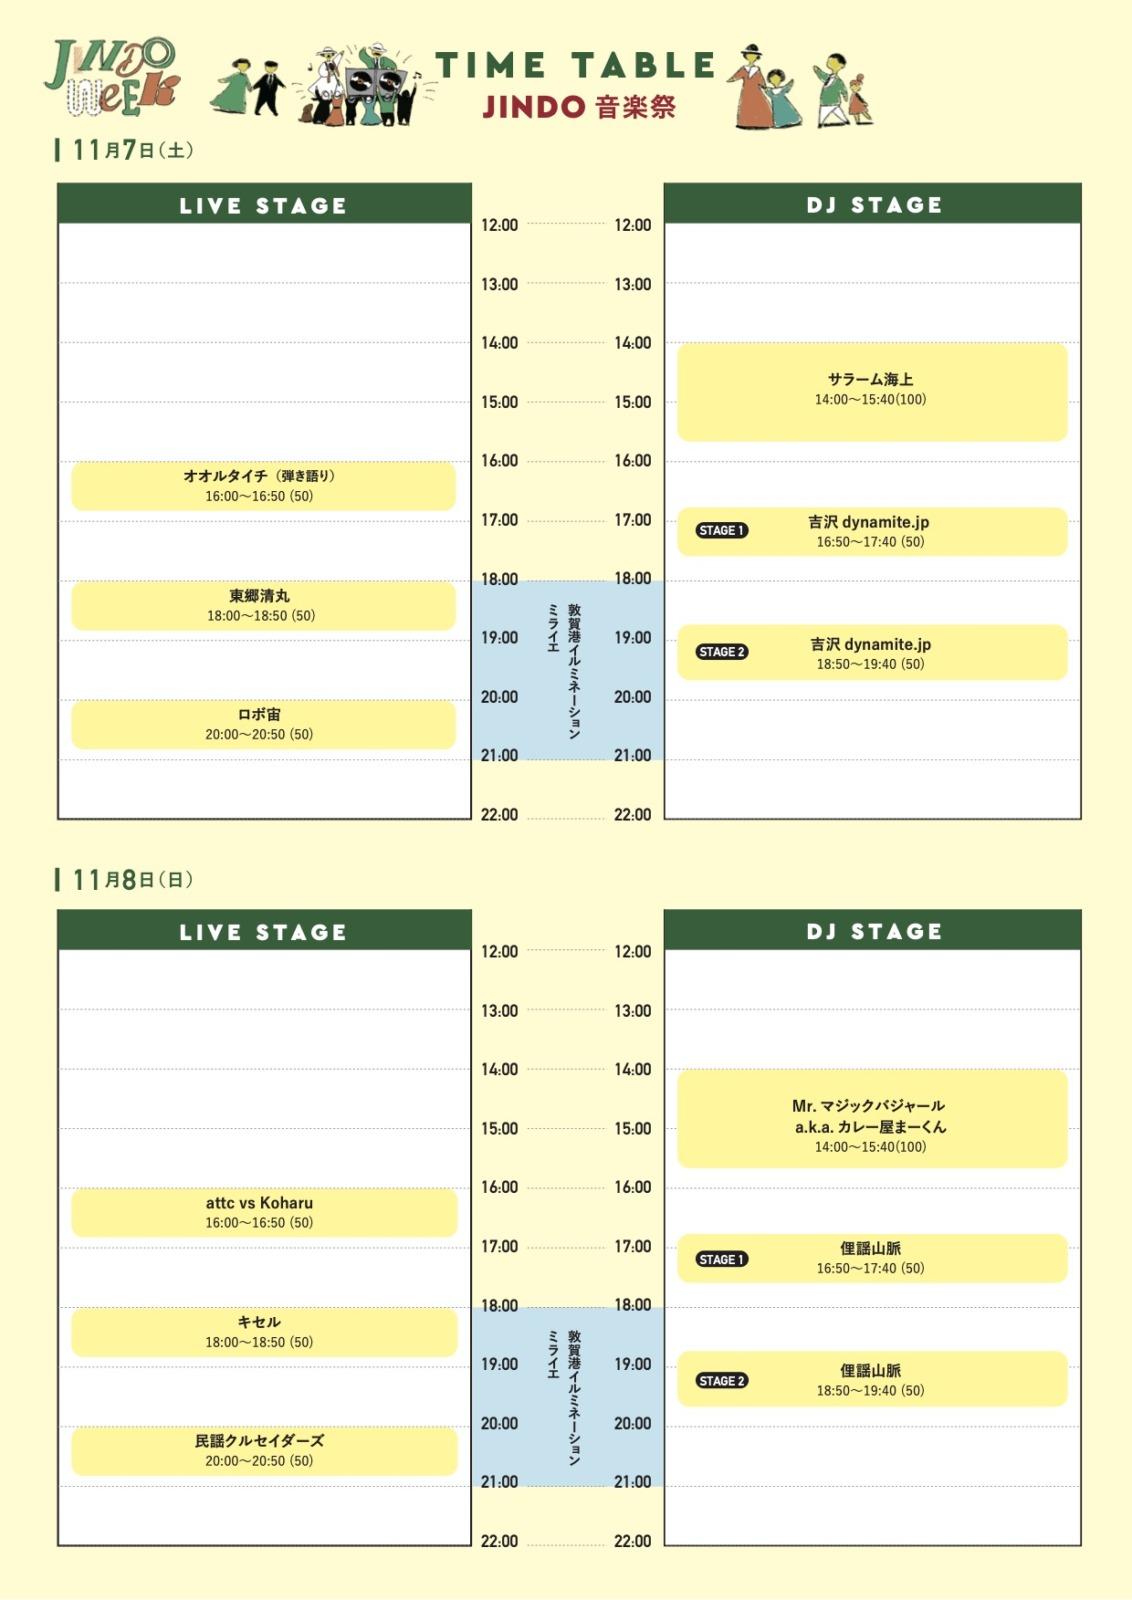 JINDO音楽祭タイムテーブル